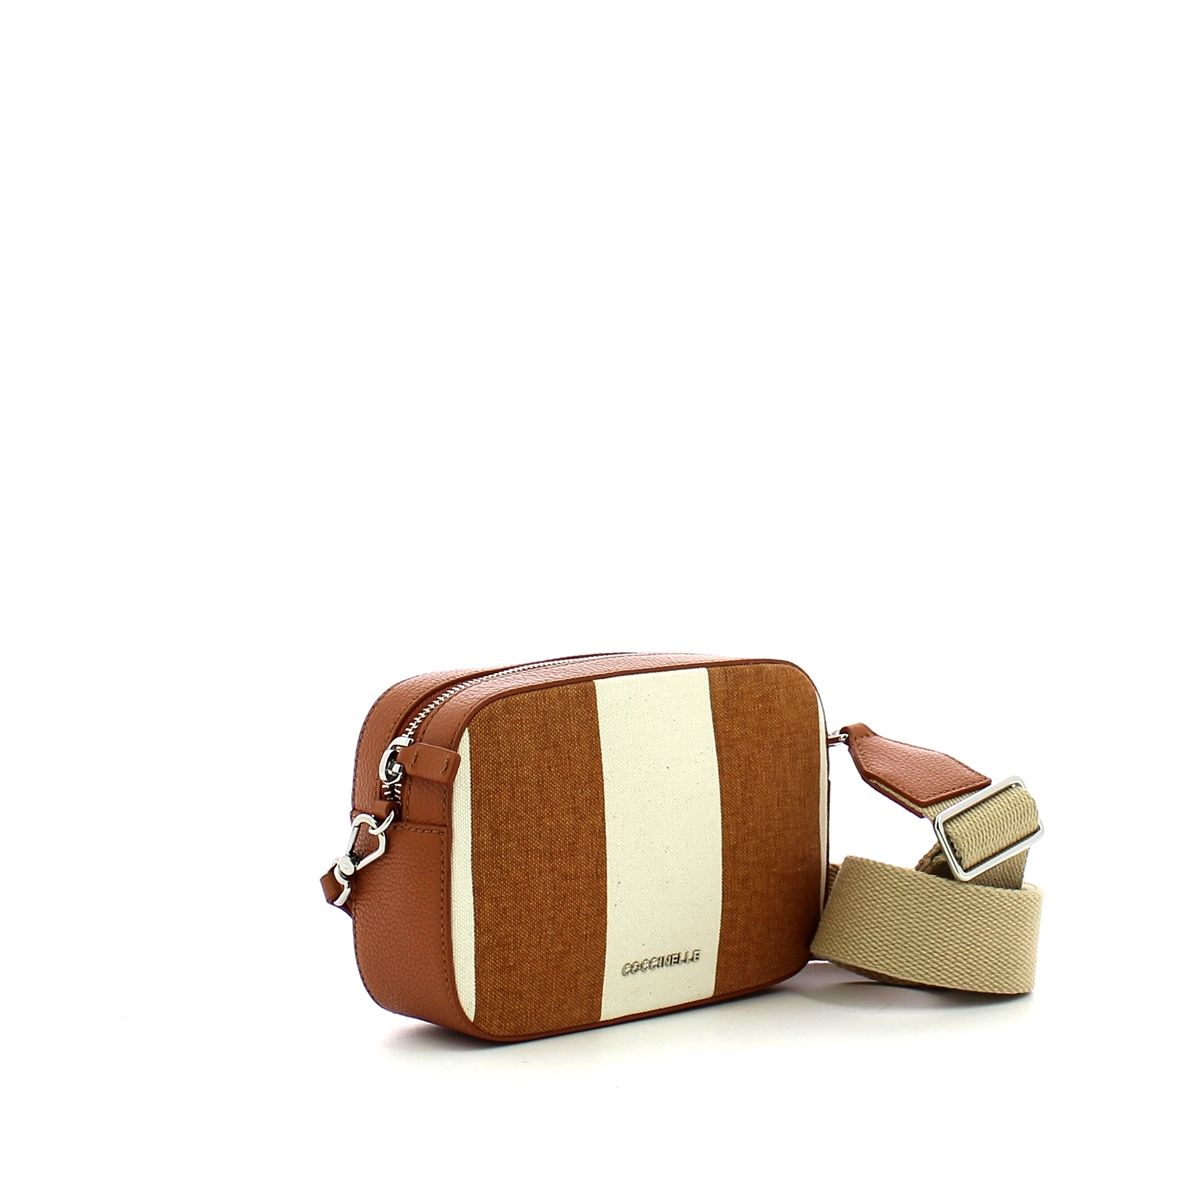 Tebe Crossbody Bag Stripes Canvas Coccinelle TAN/TAN